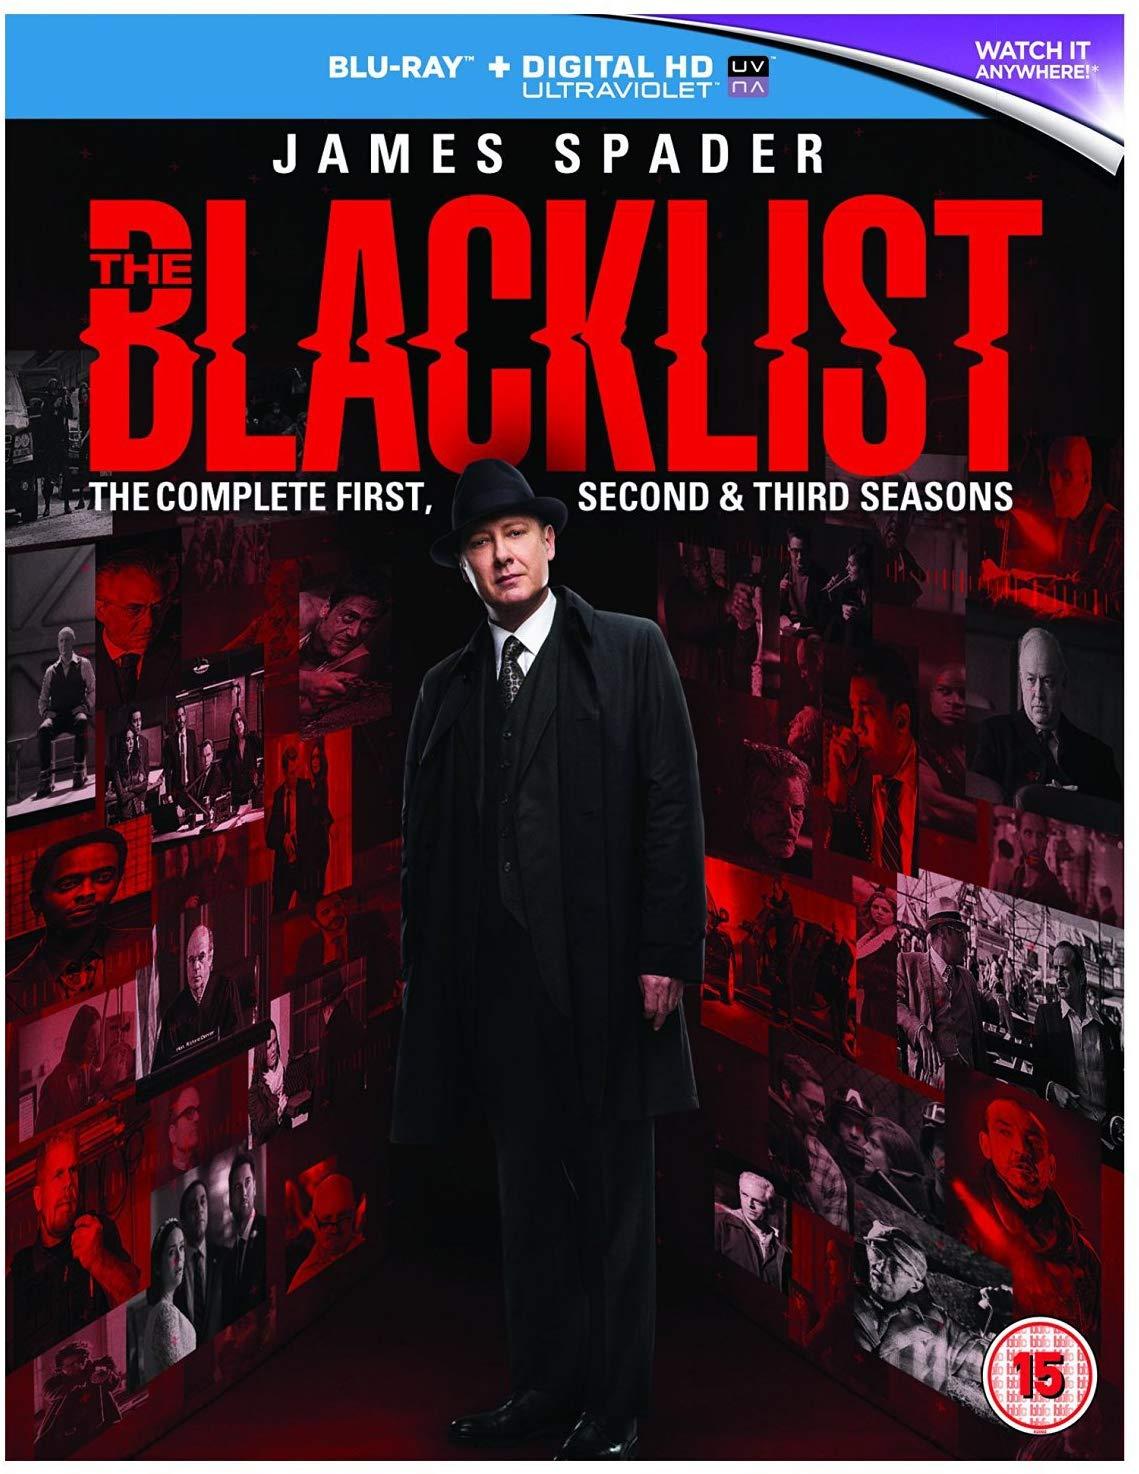 The Blacklist Season 1-3 Blu-ray Box Set £2.60 @ Amazon (£5.59 Non Prime)